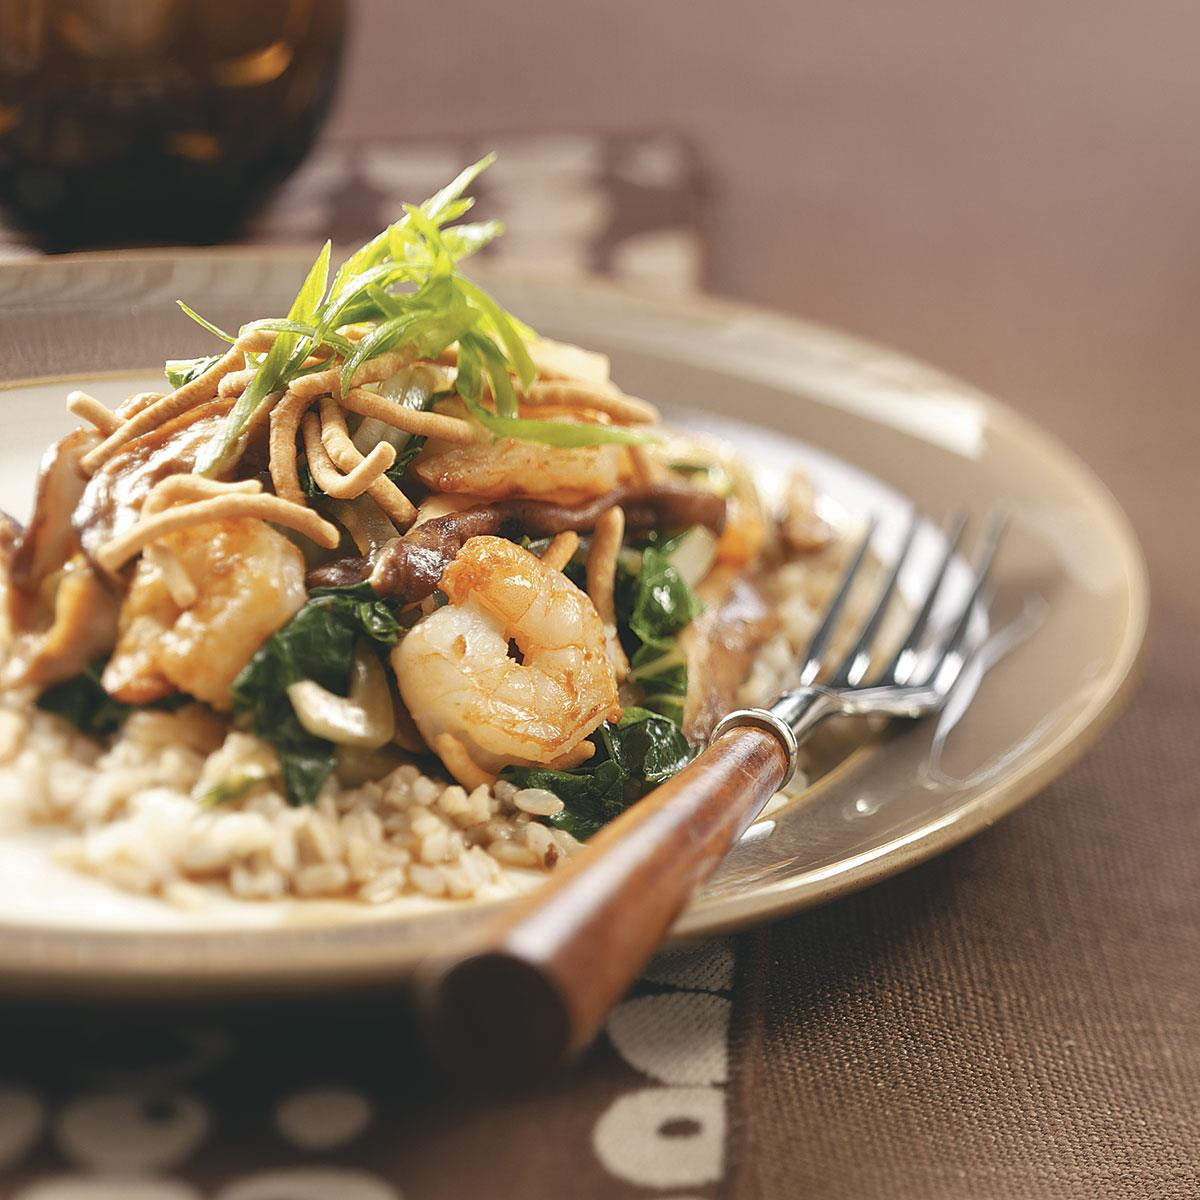 Shrimp & Shiitake Stir-Fry with Crispy Noodles